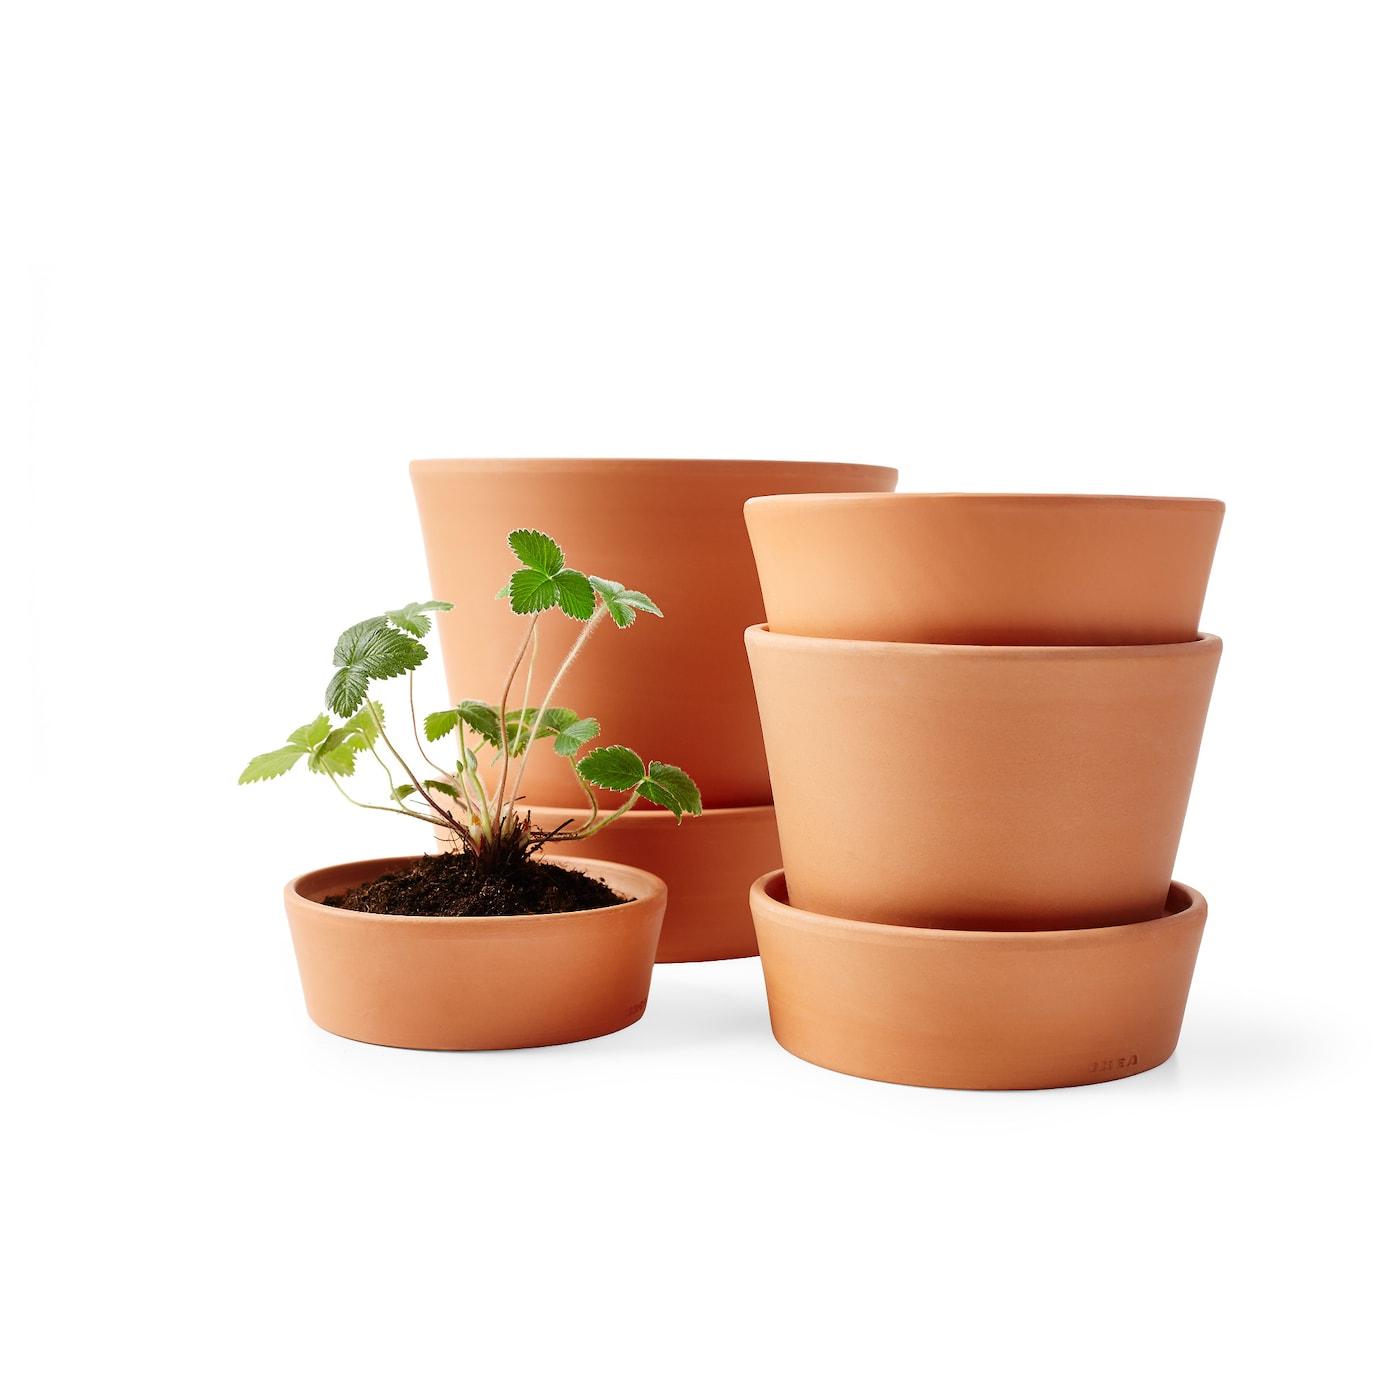 ingef ra plant pot with saucer outdoor terracotta 12 cm ikea. Black Bedroom Furniture Sets. Home Design Ideas